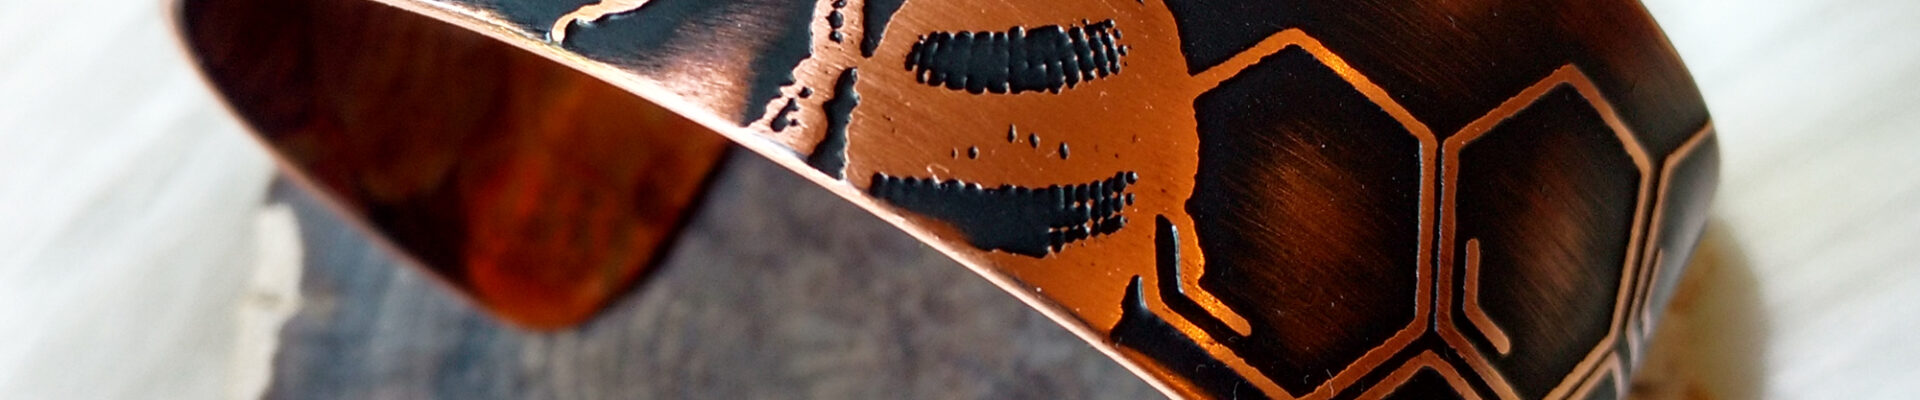 Bee in Hive, Copper Cuff, Handmade Bracelet